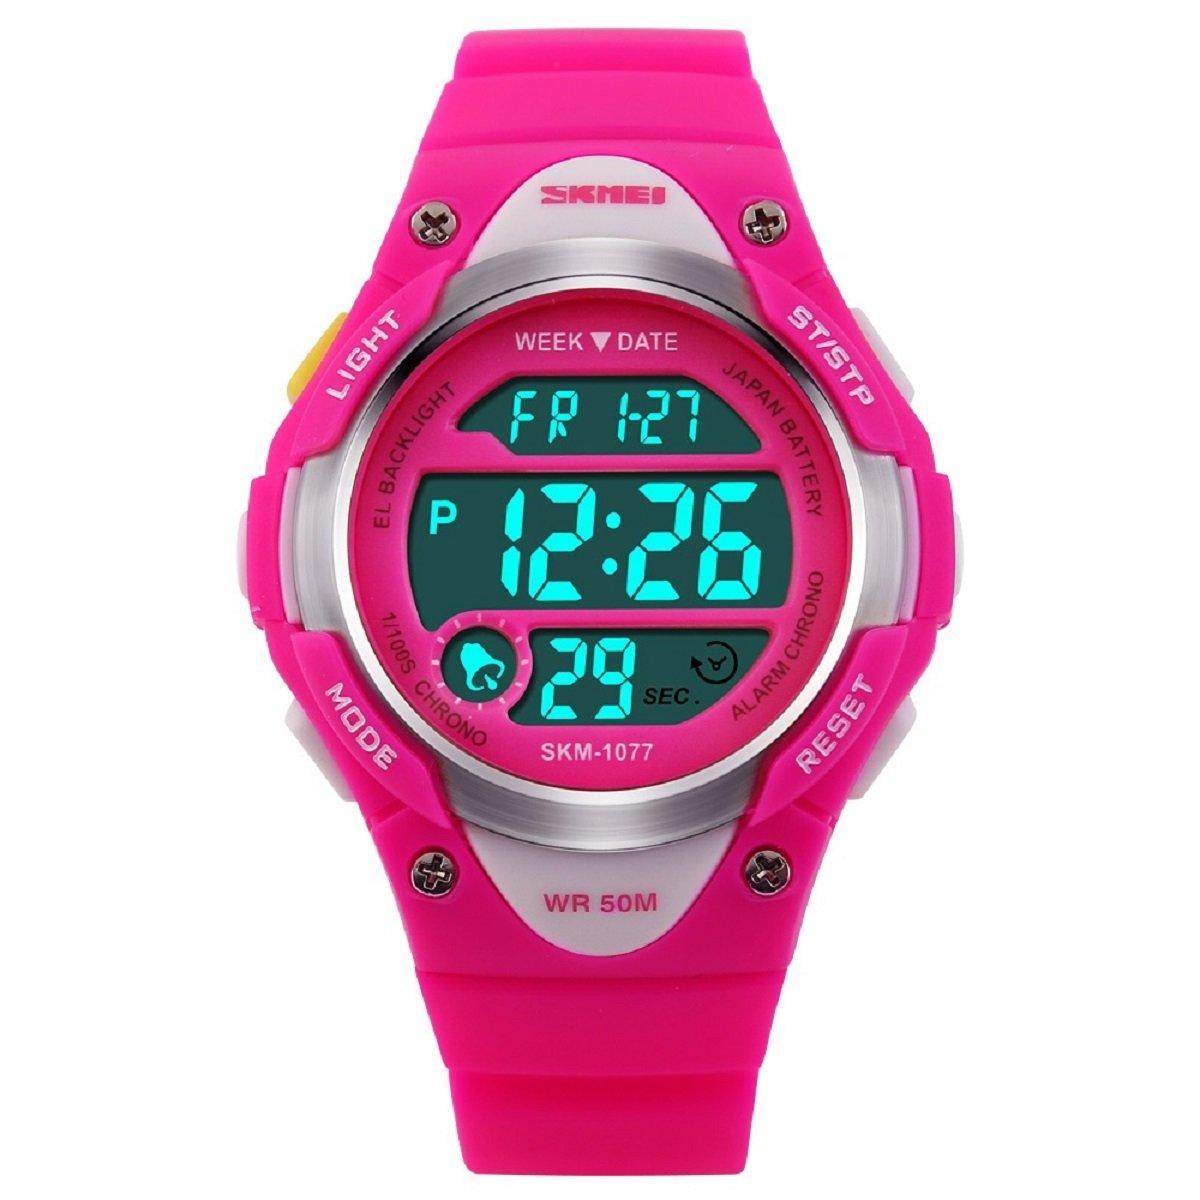 Watch,Kids Boys Girls Watch,Kids Casual DIgital LED Outdoor Sports Watch,30M Water Resistant Chronograph Alarm Calendar Dress Watch by ALPS